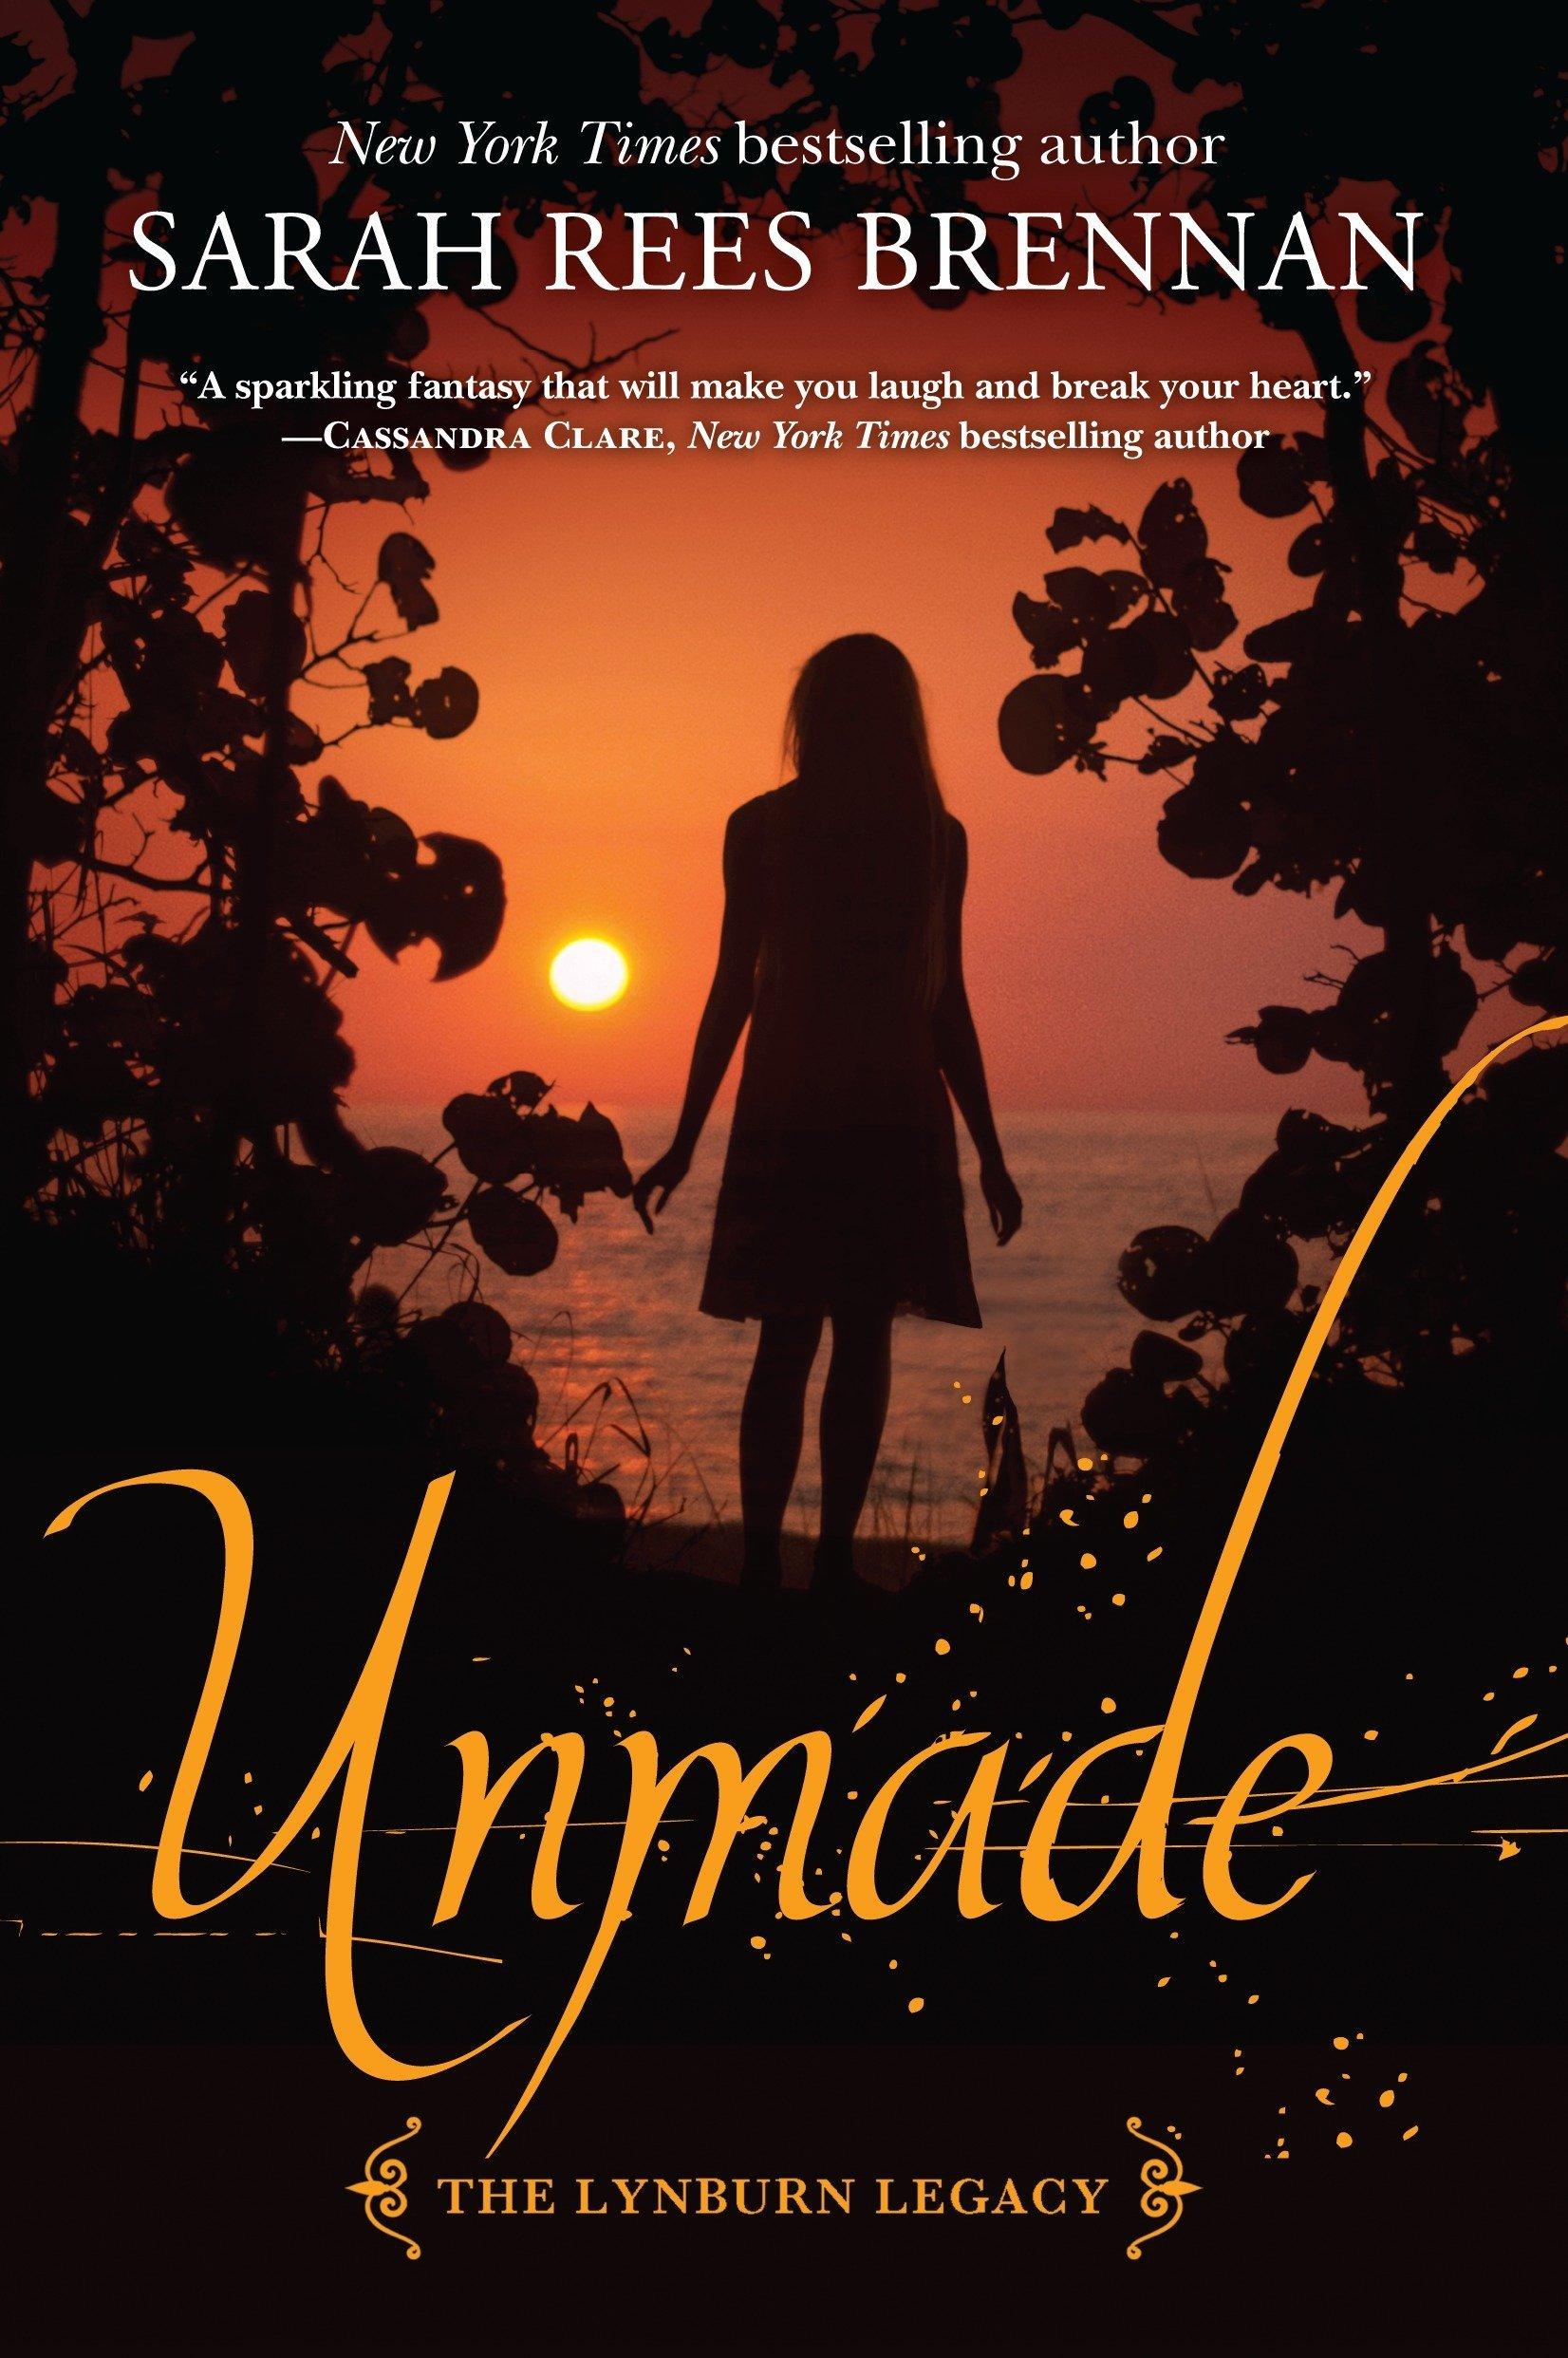 amazon com unmade the lynburn legacy book 3 9780375871054